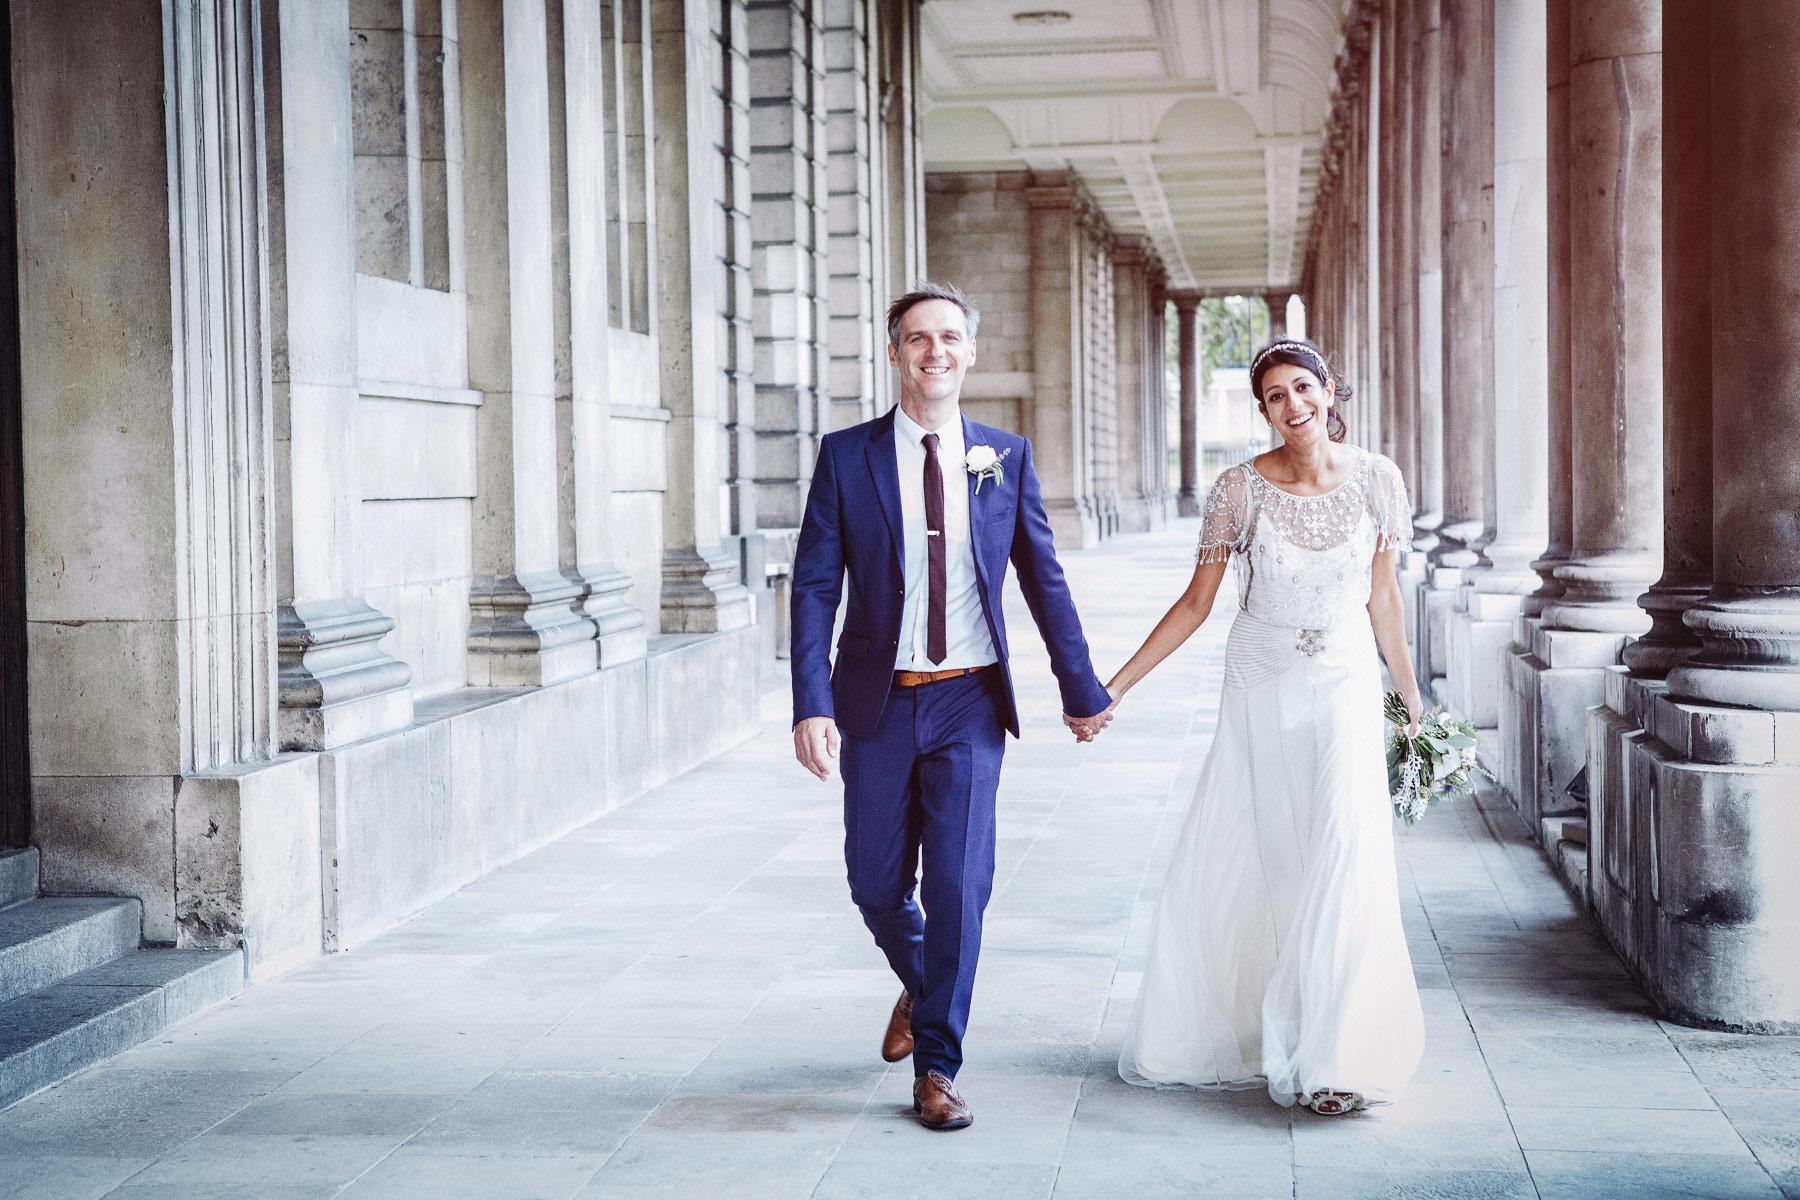 Wedding Photography at The Trafalgar Tavern